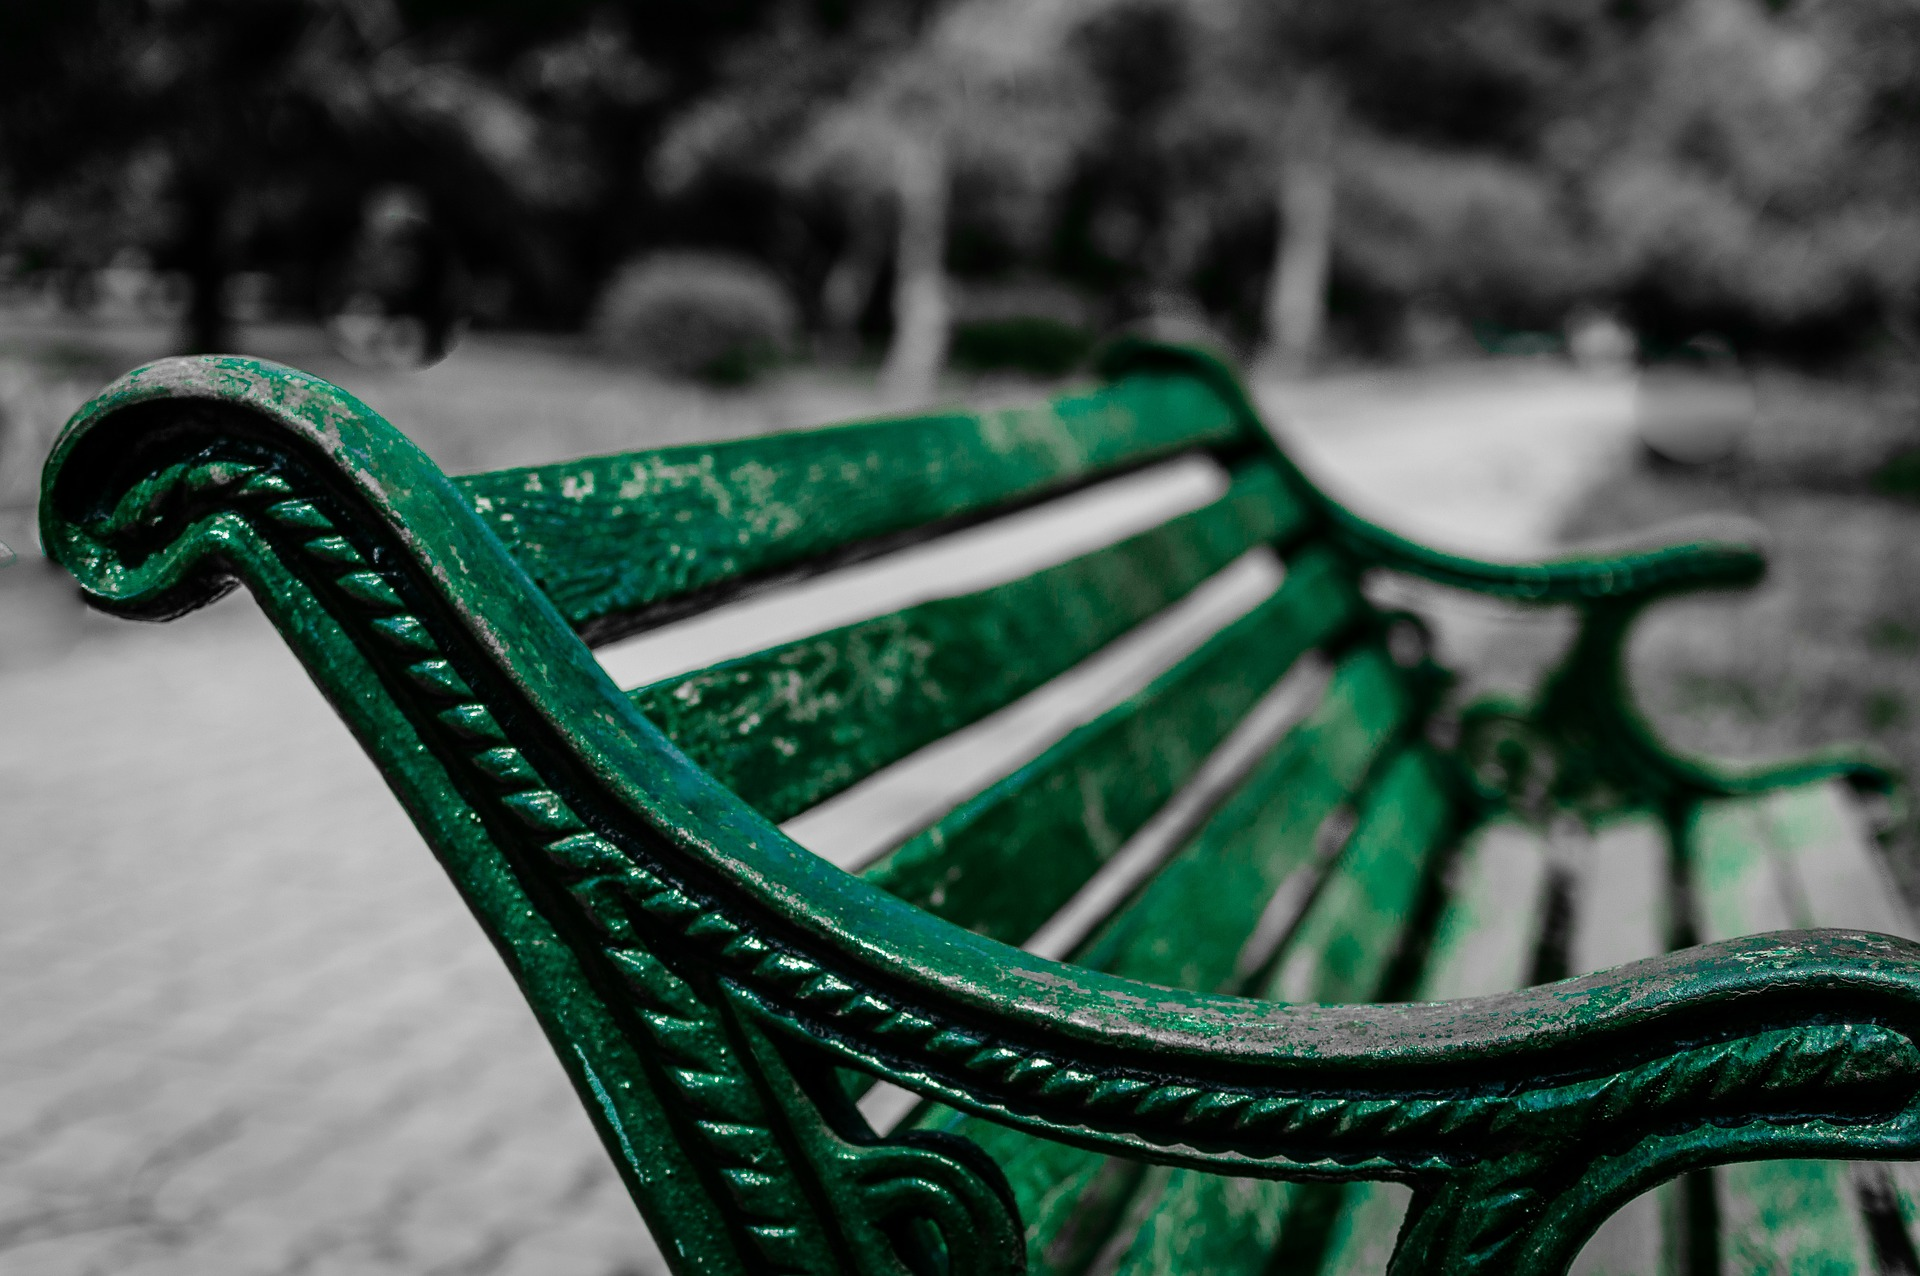 parks, recreation, nature